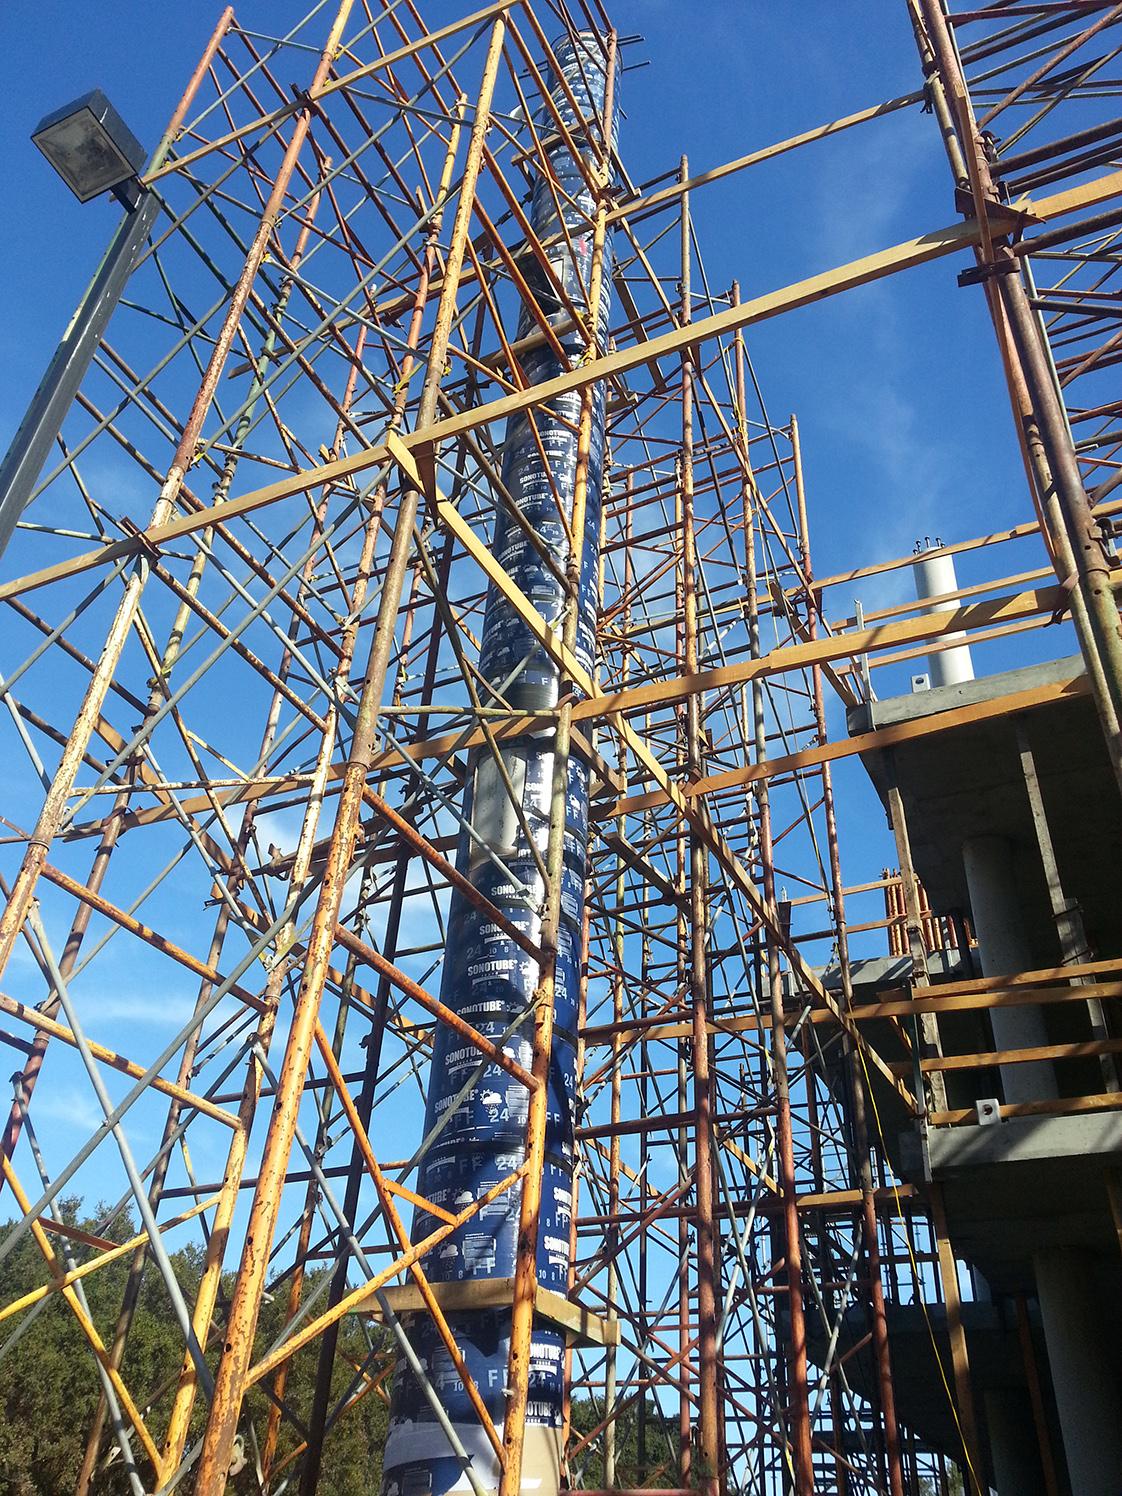 Stanford School of Medicine C.J. Huang Building Under Construction Column Pour